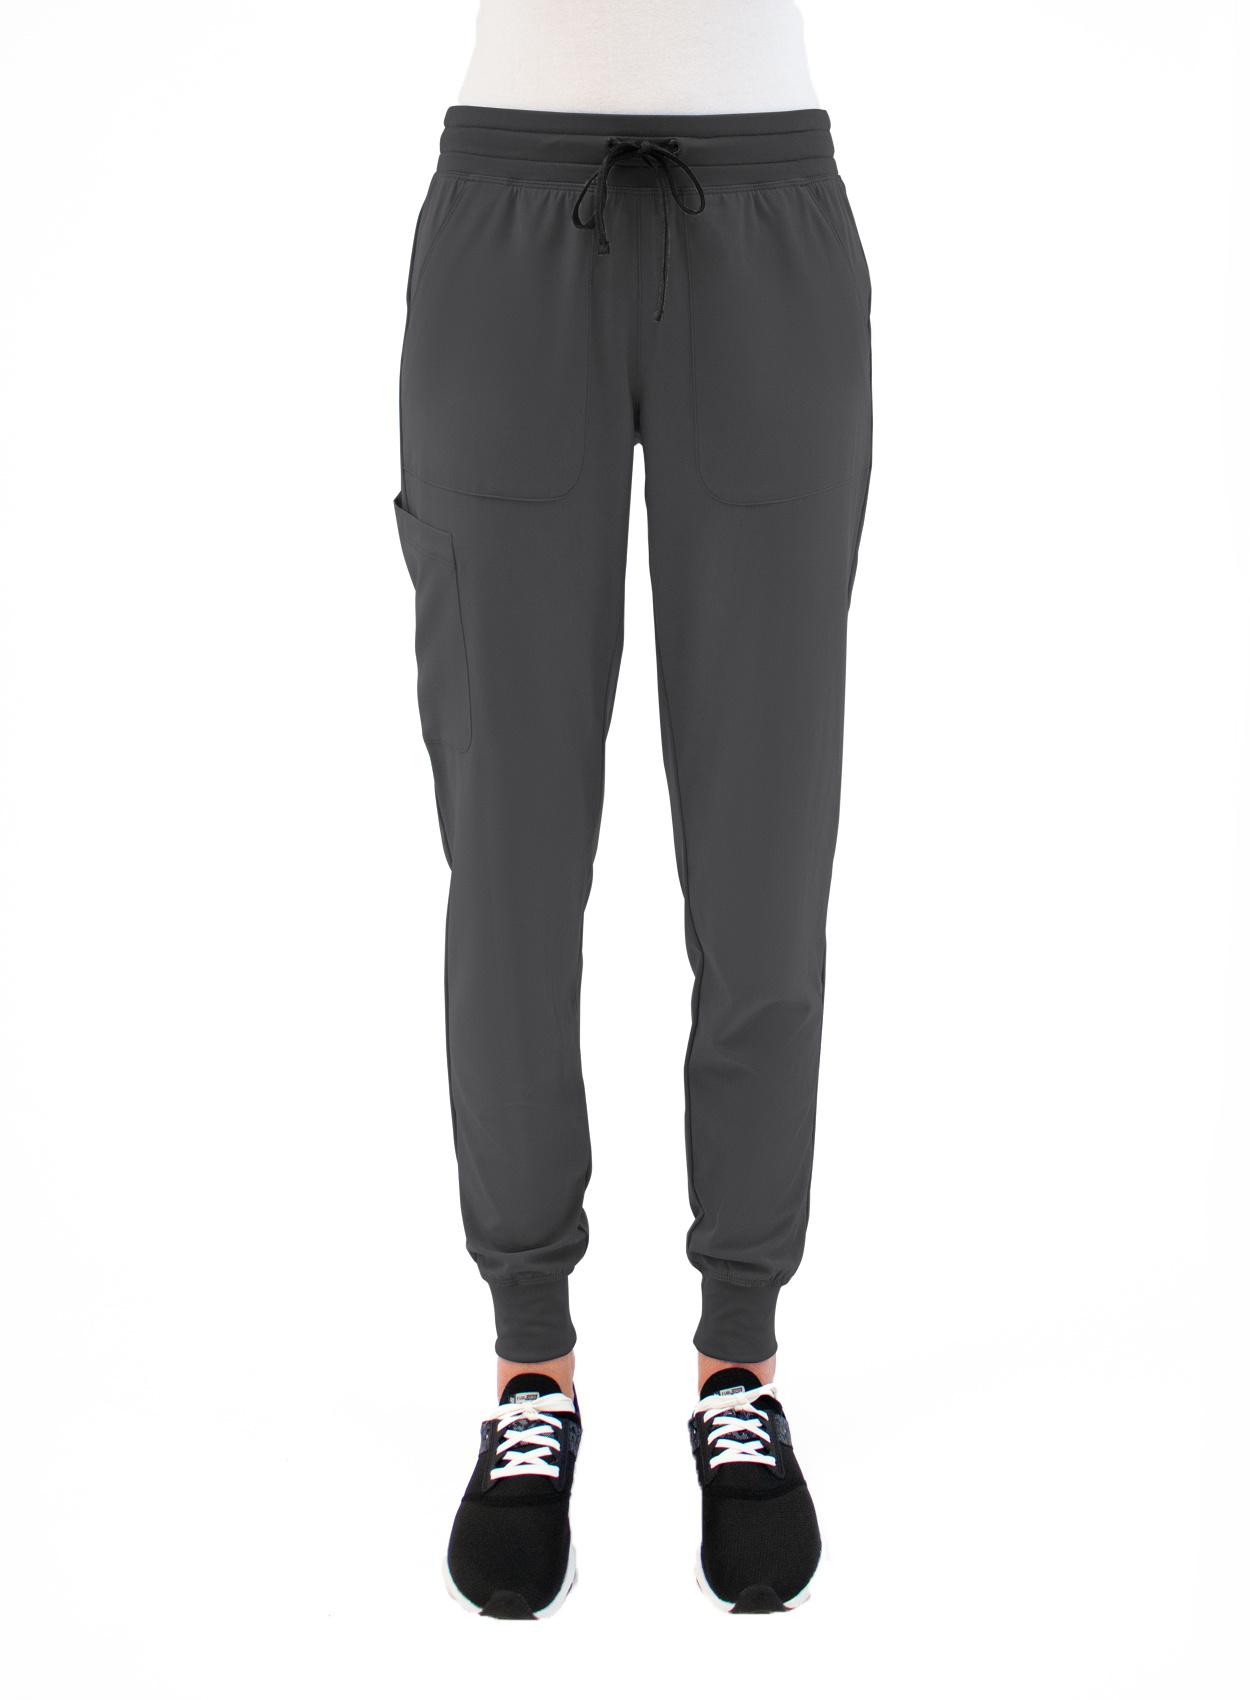 MATRIX IMPULSE Pewter Grey Yoga Waistband Women's Jogger Pants 8520